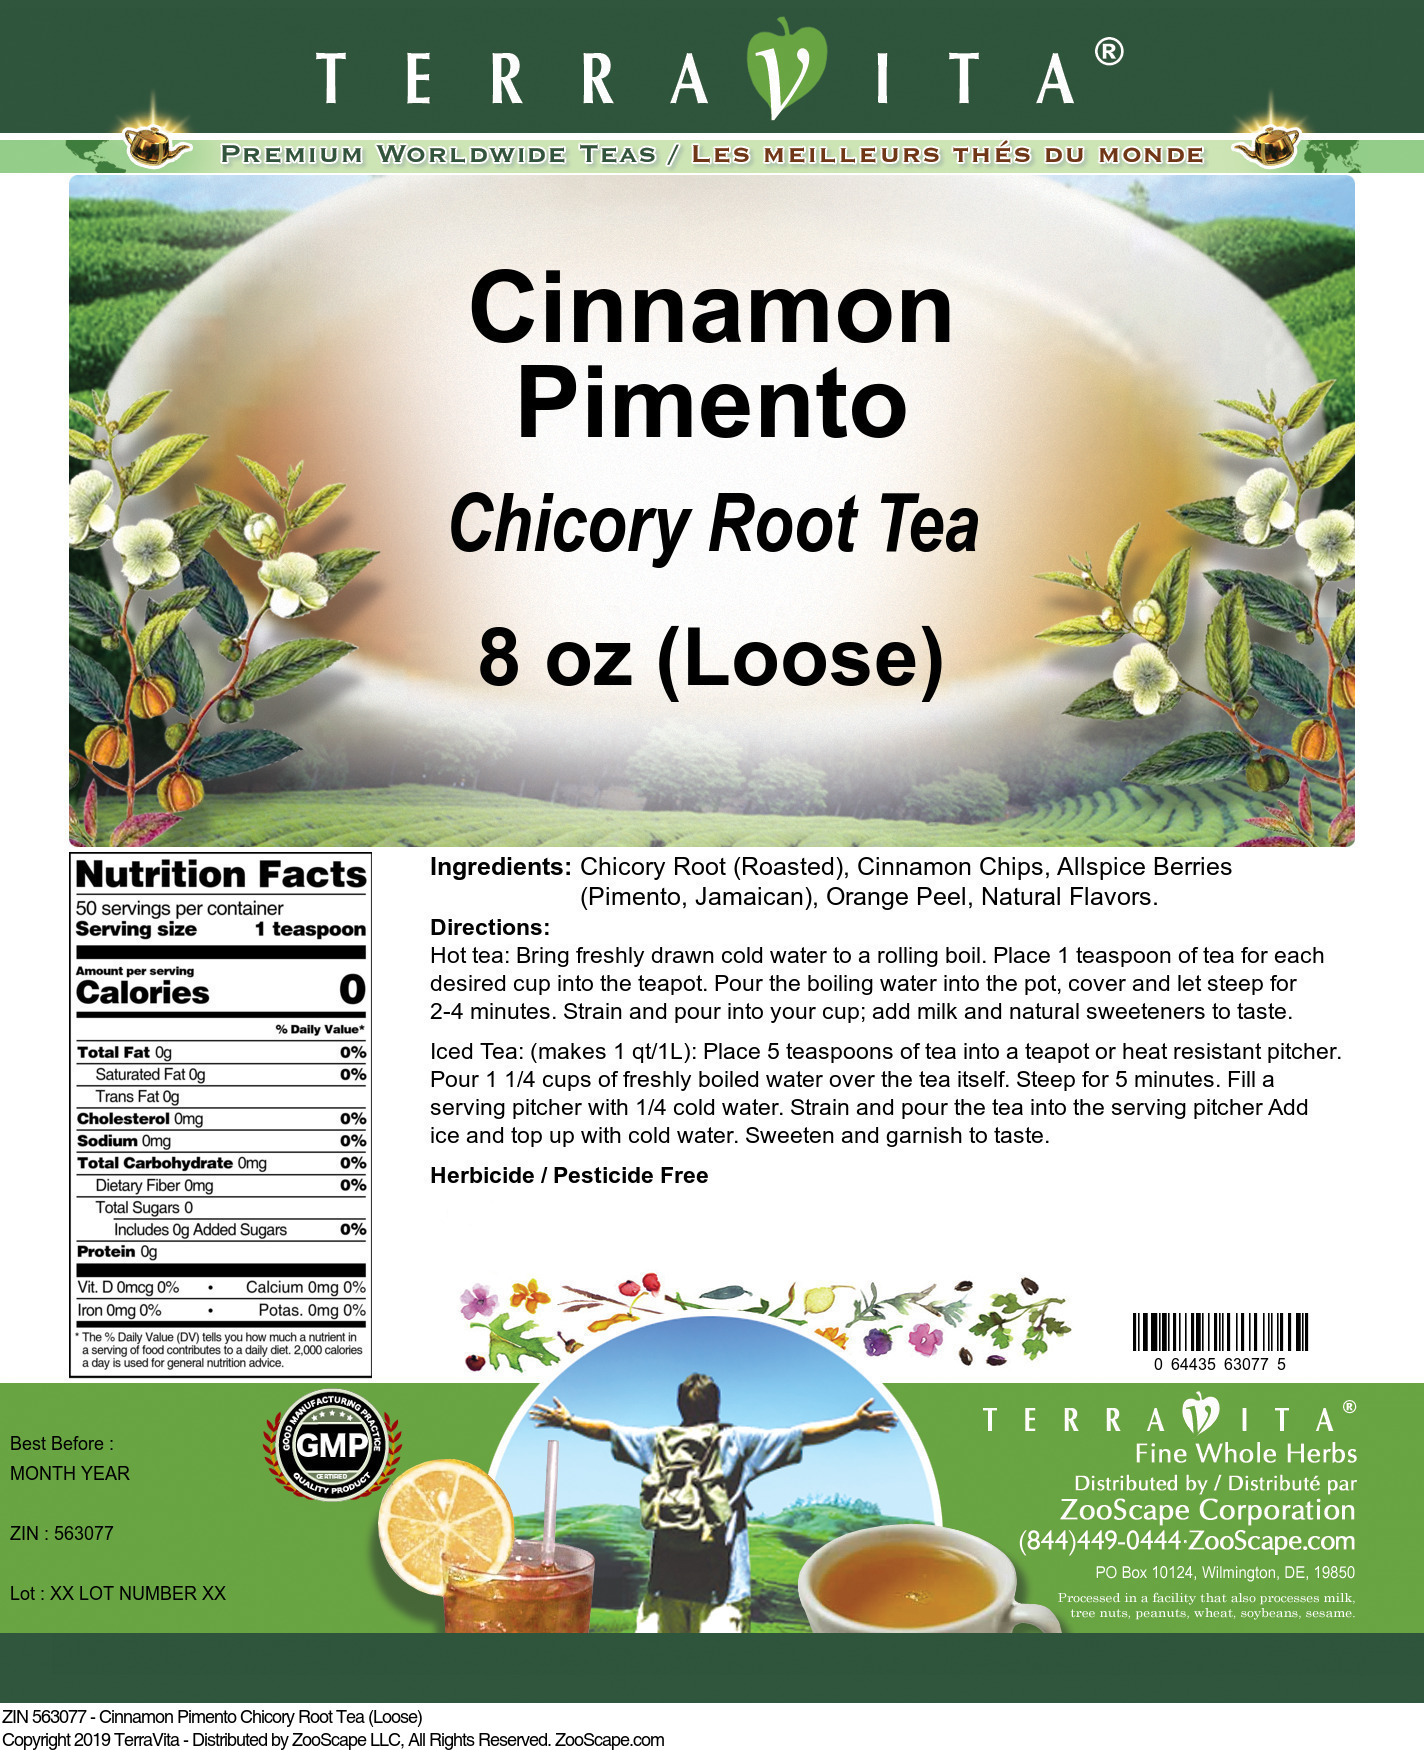 Cinnamon Pimento Chicory Root Tea (Loose)